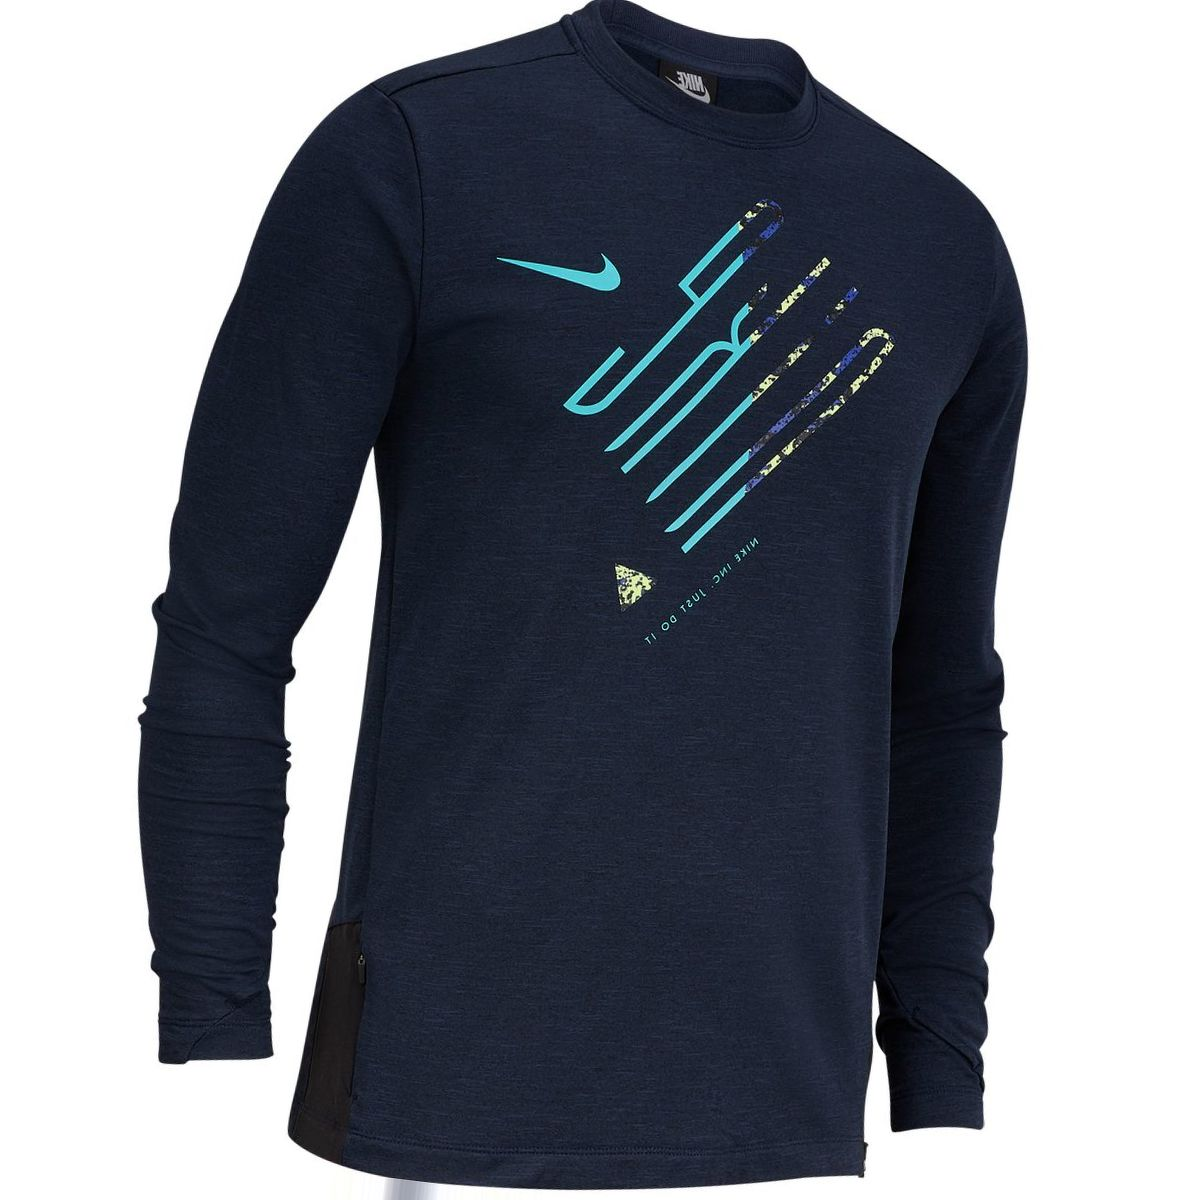 Nike Sphere Element Crew Wild Long-Sleeve Running Shirt - Men's